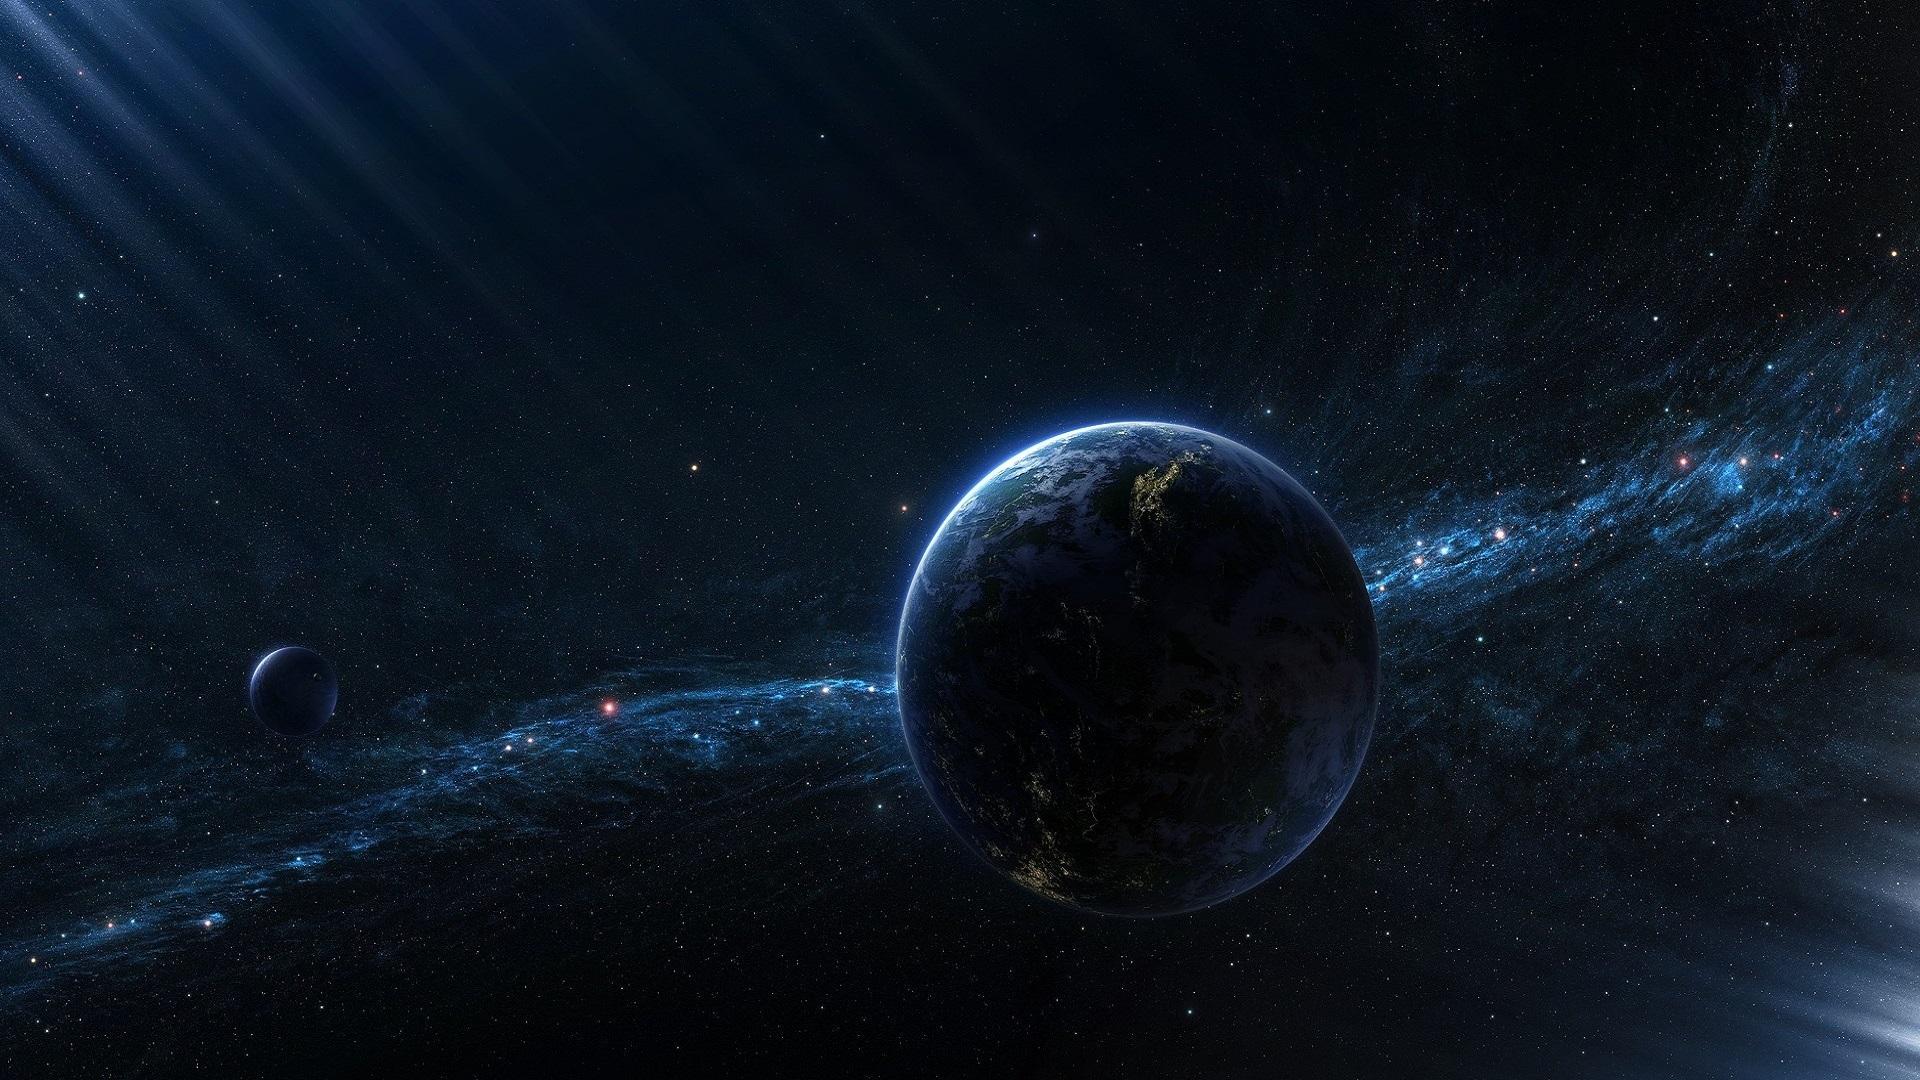 http-best-hd-com-wp-content-uploads-Planet-Earth-jpg-wallpaper-wp5207641